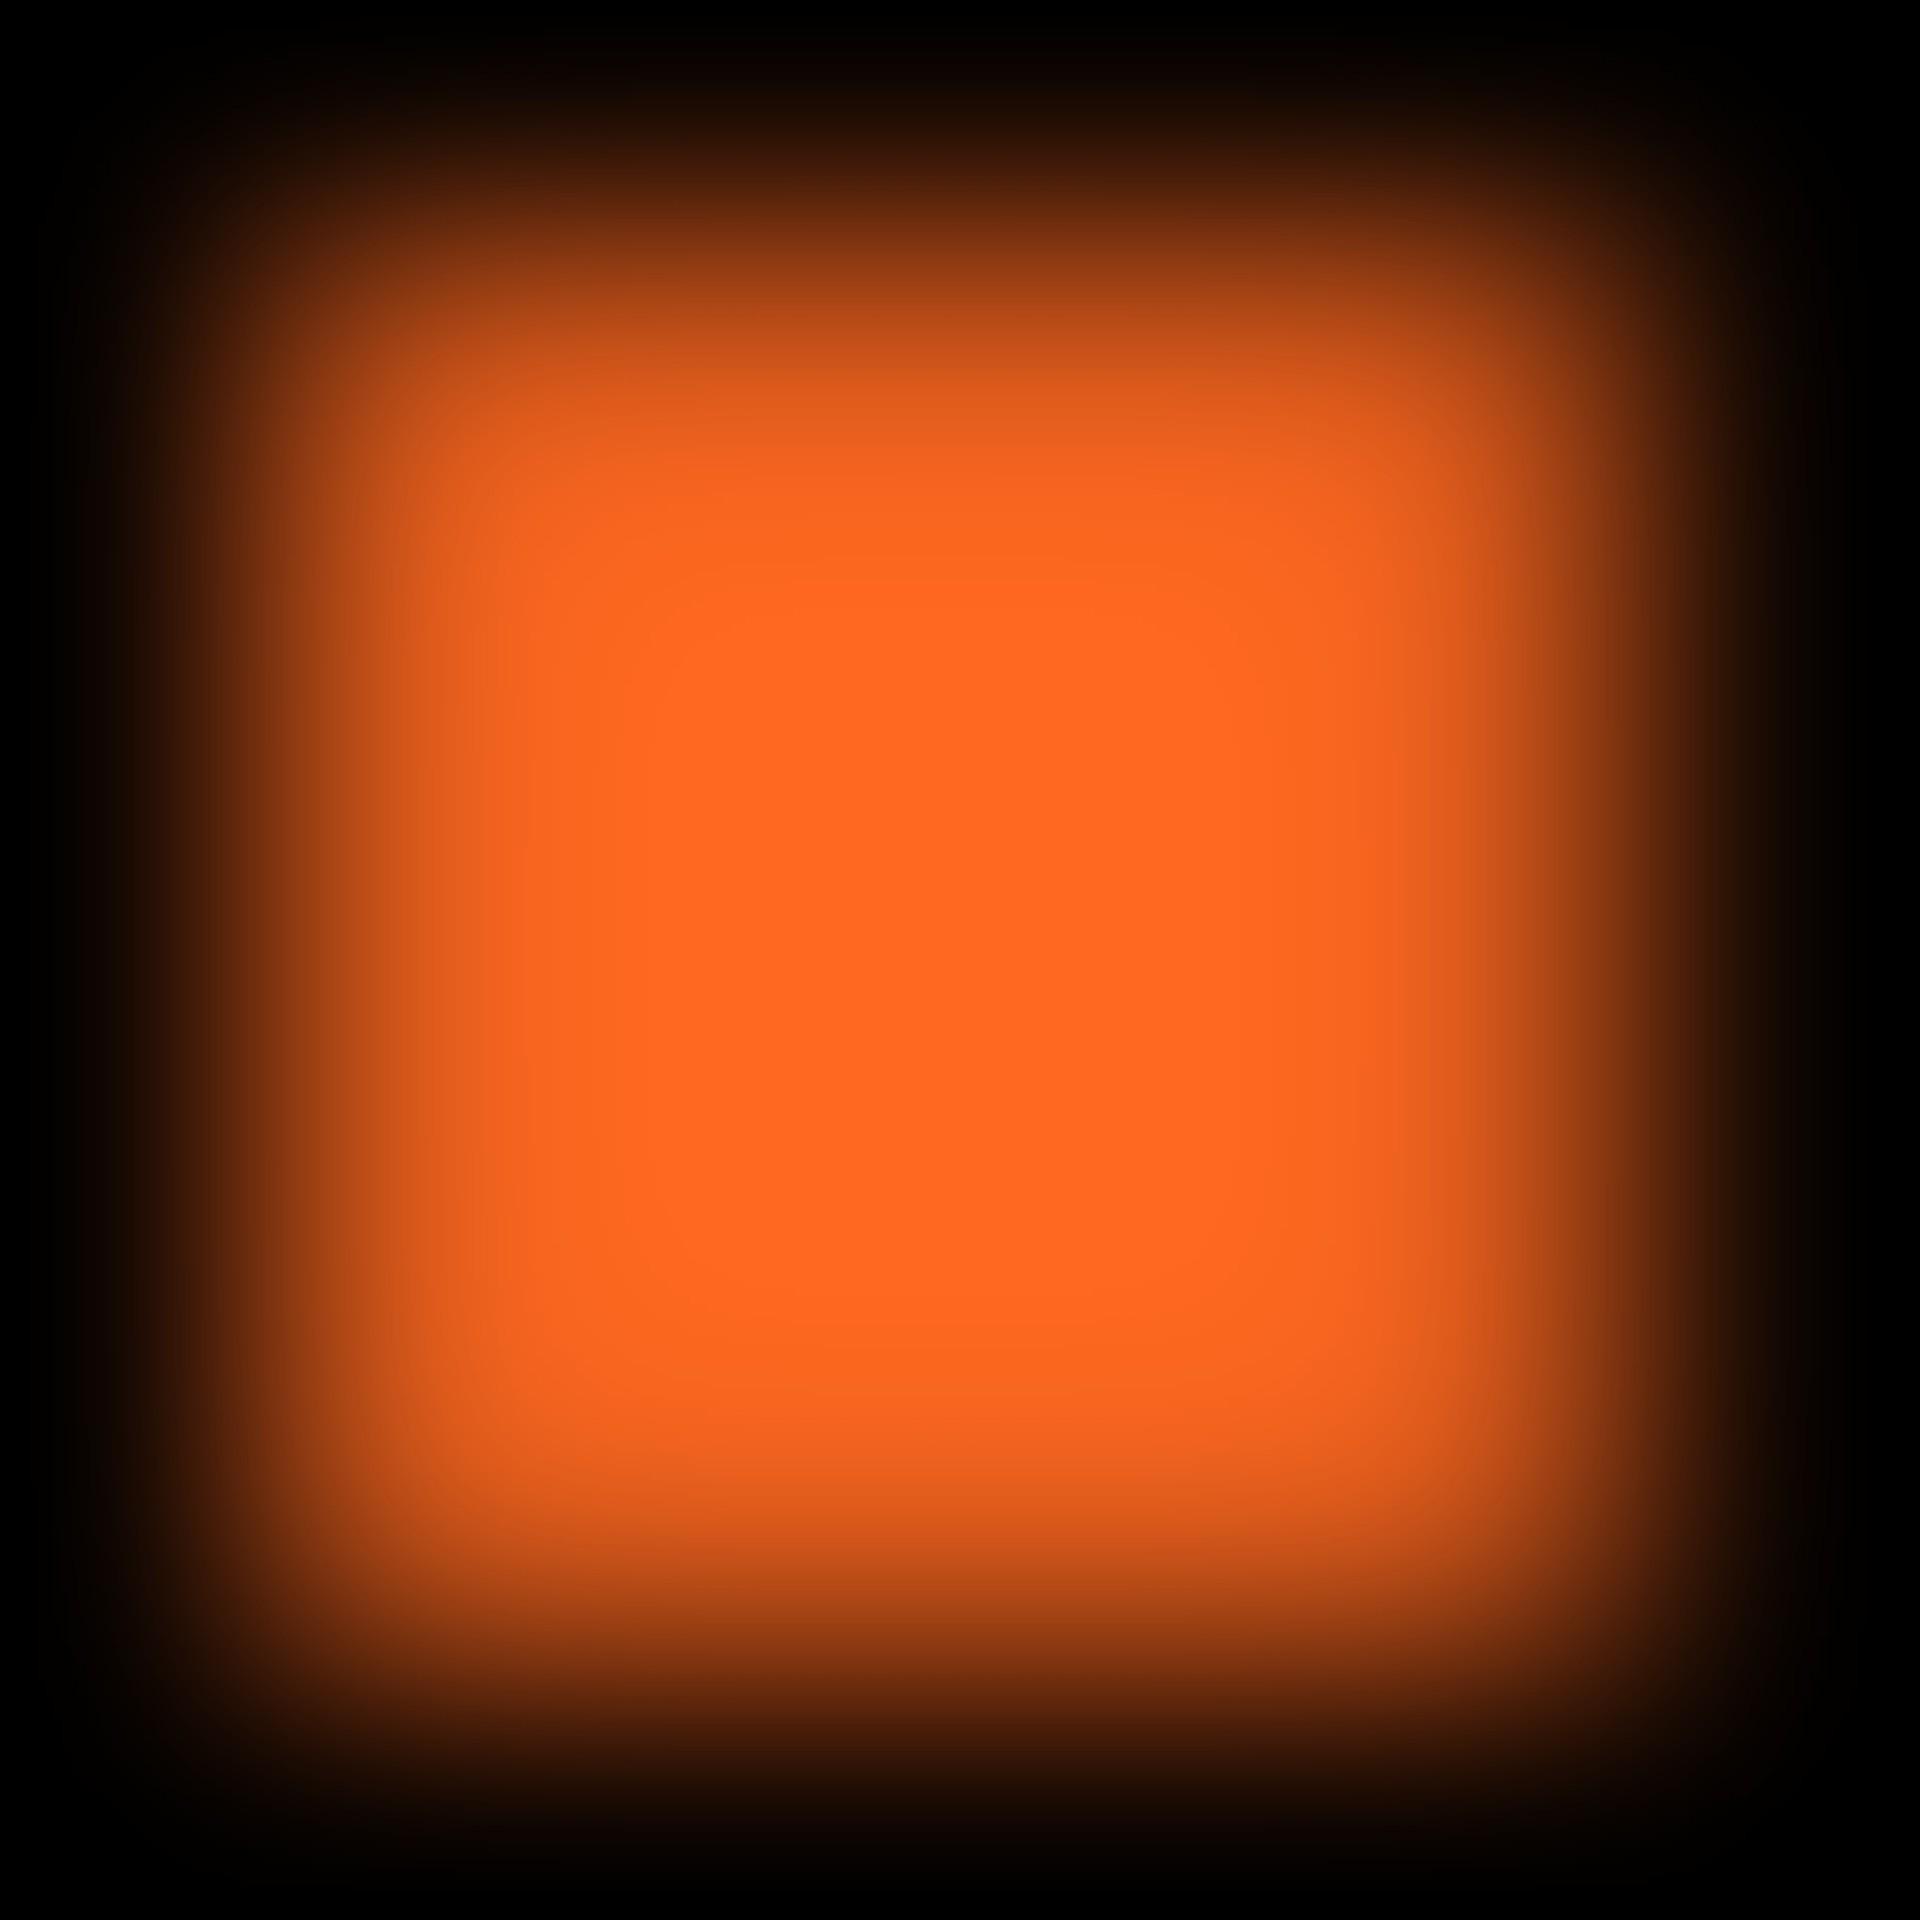 Orange Color Wallpaper Hd Orange Gradient Frame Free Stock Photo Public Domain